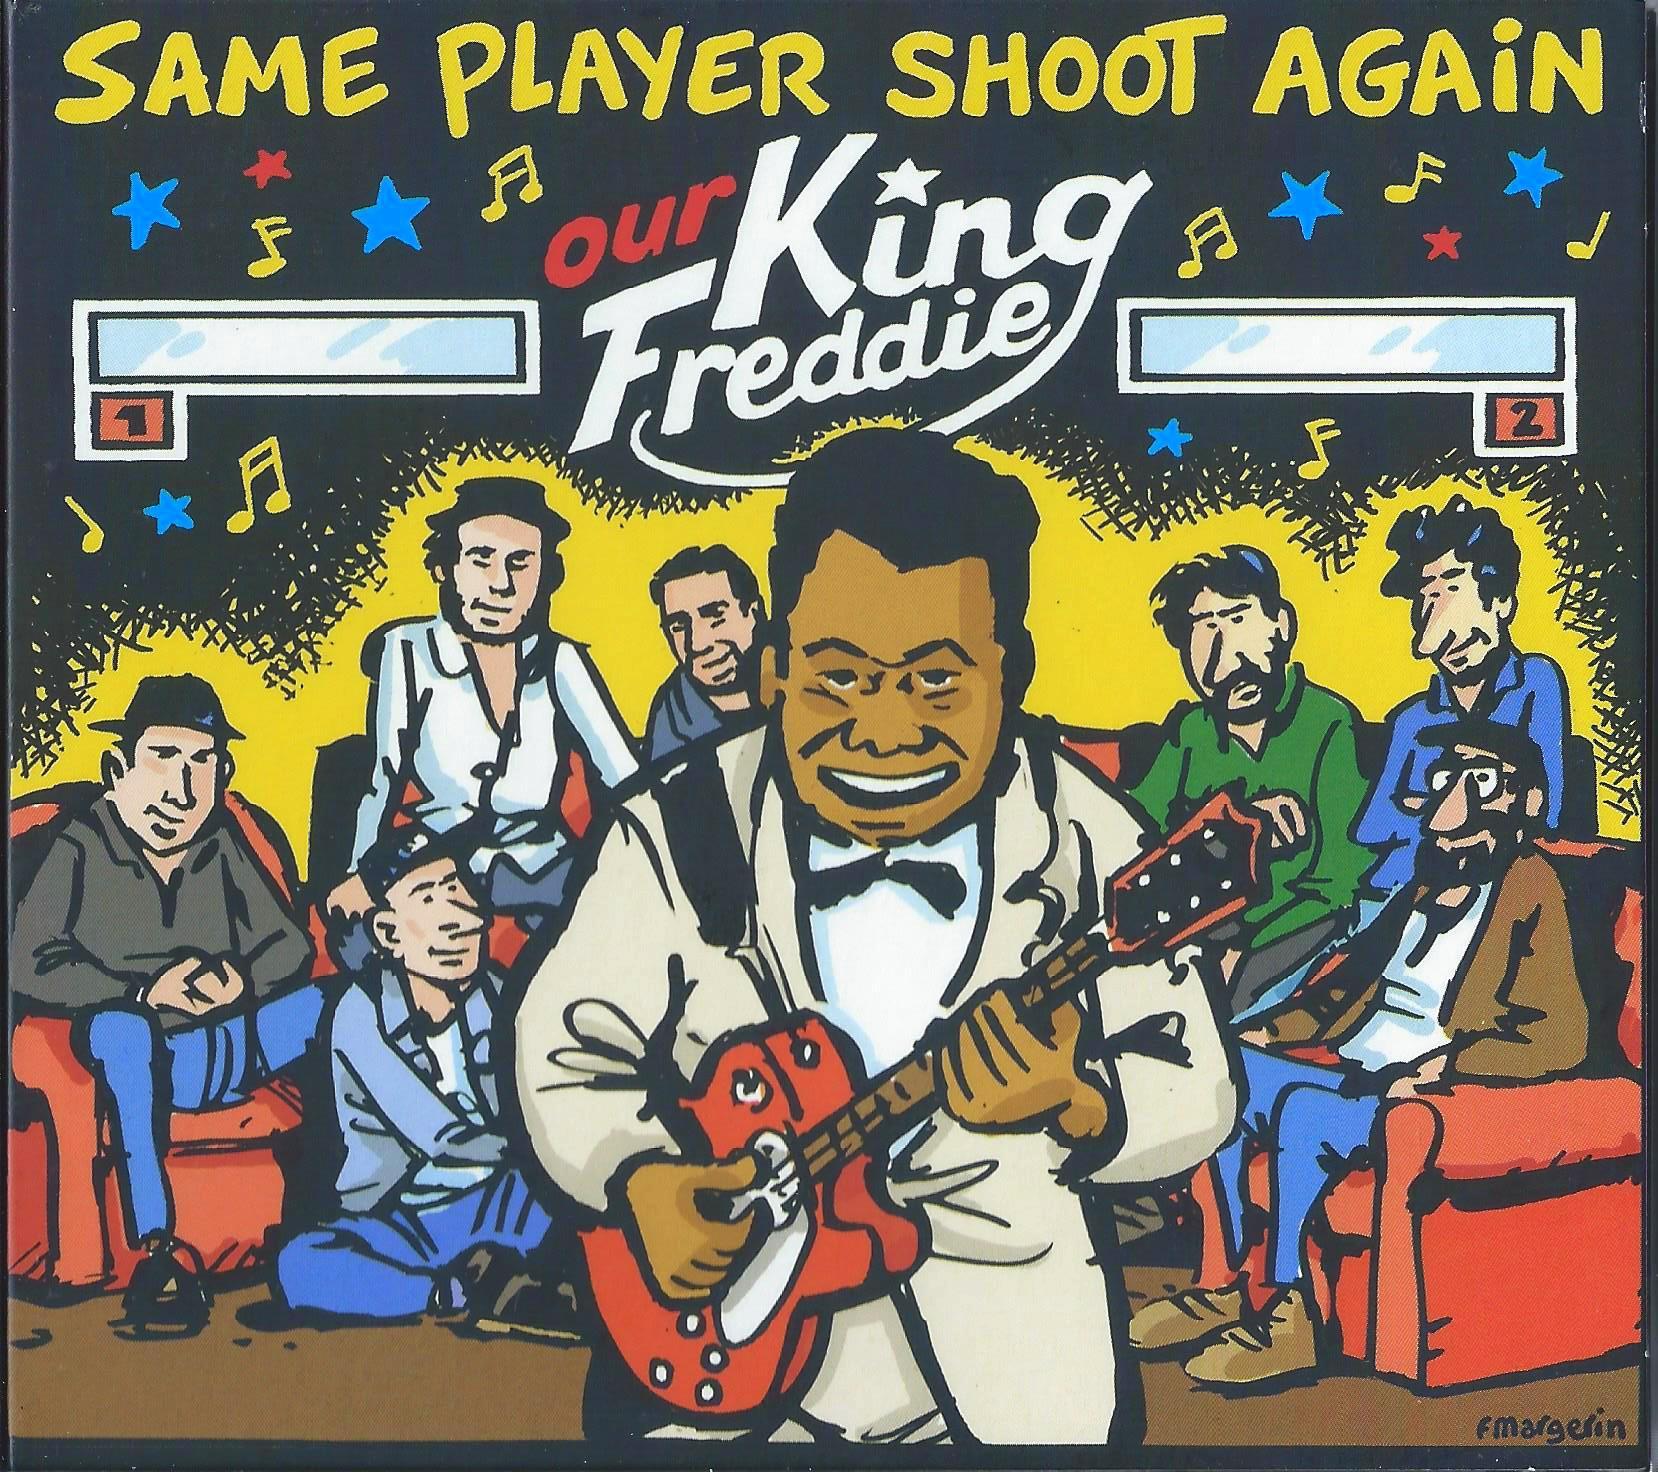 SAME PLAYER SHOOT AGAIN – Our King Freddie